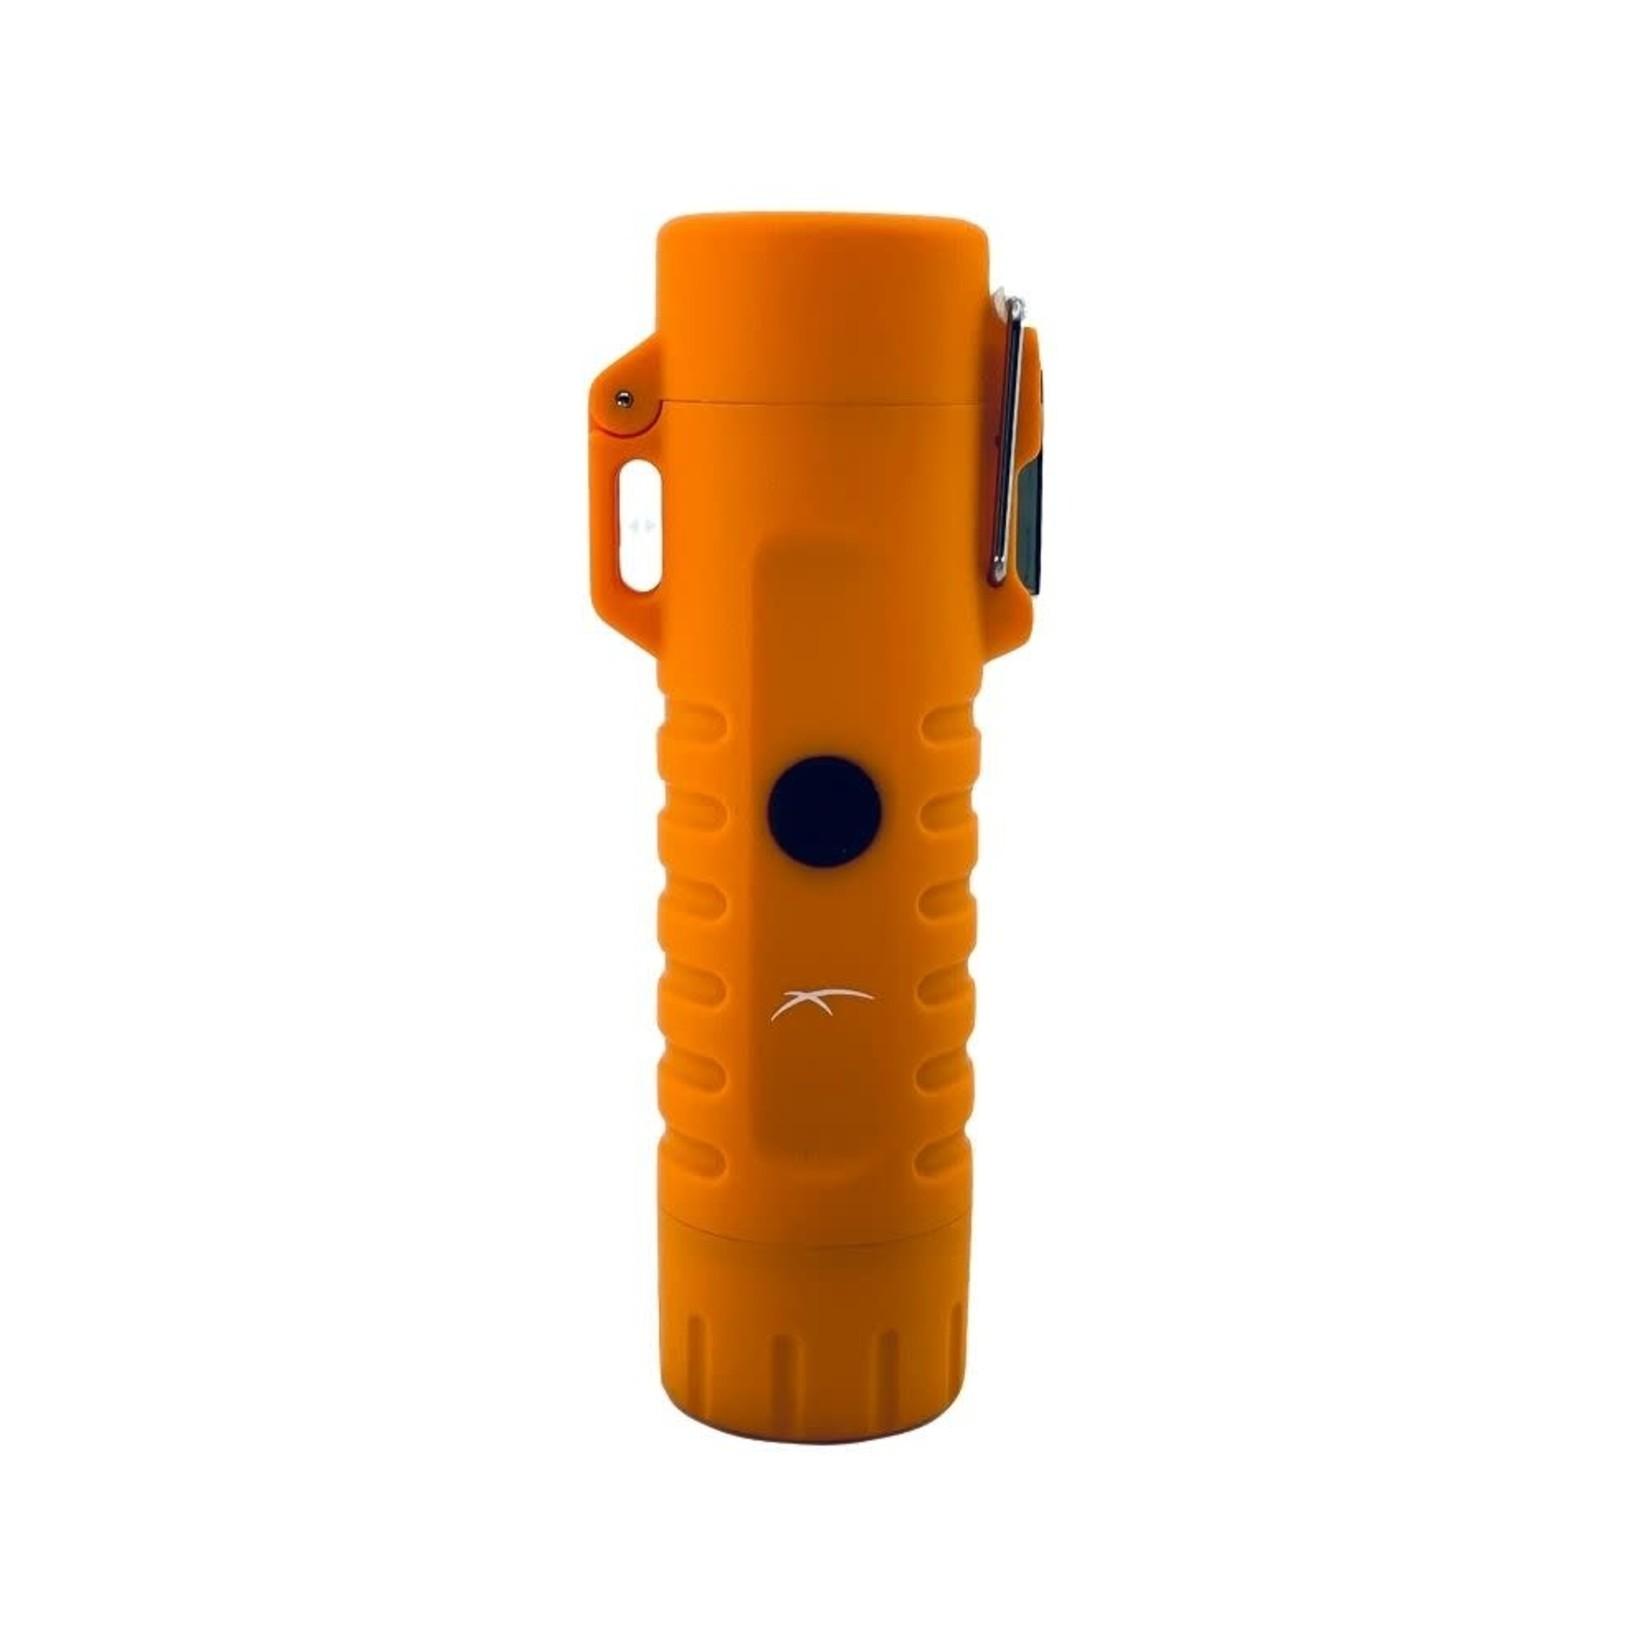 The Survival Sizzle Lighter in Orange